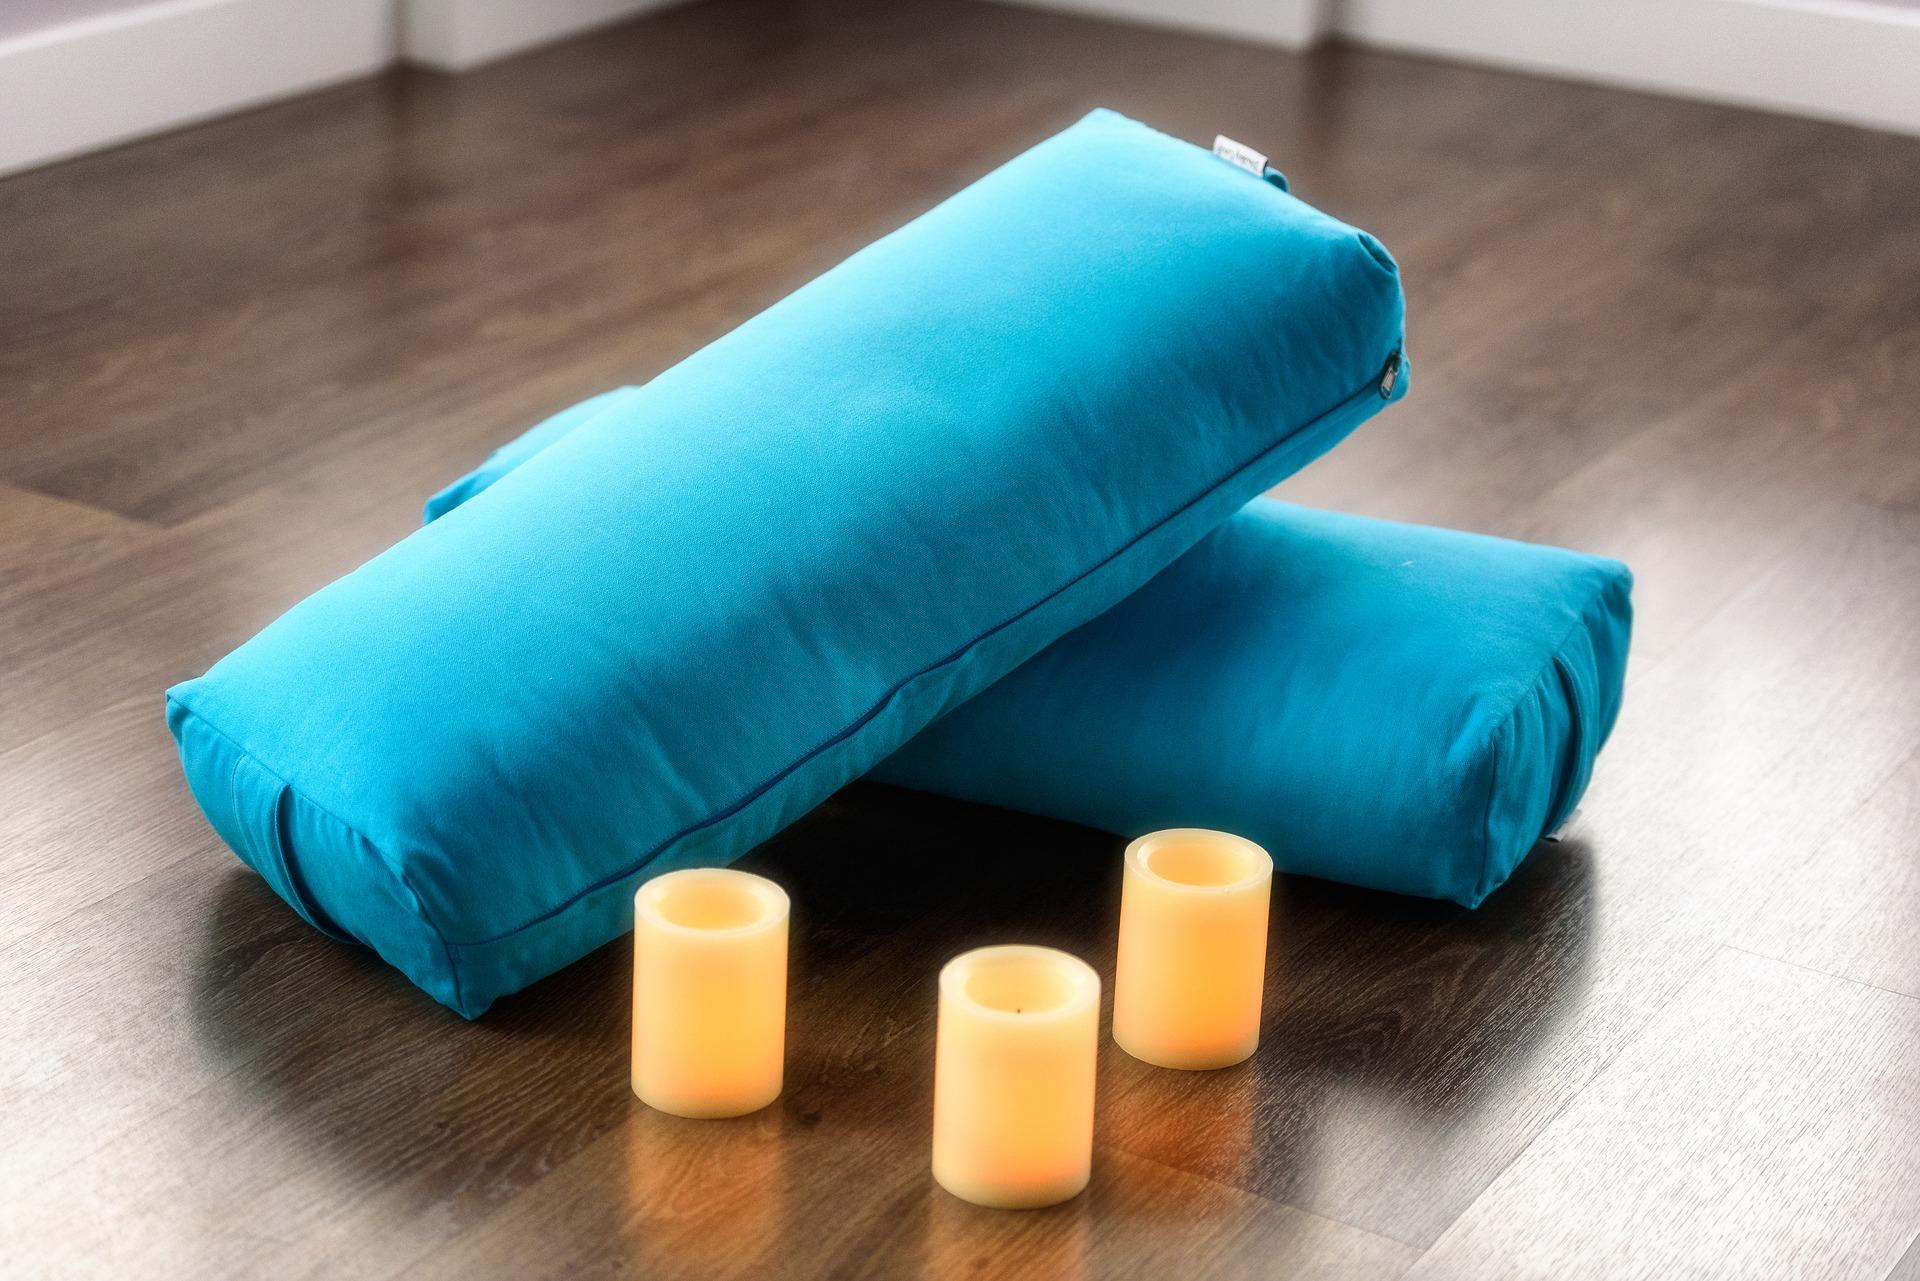 Yogalounge Nicole Veith Walzbachtal | Yoga & ich | Raumvermietung in der Yogalounge